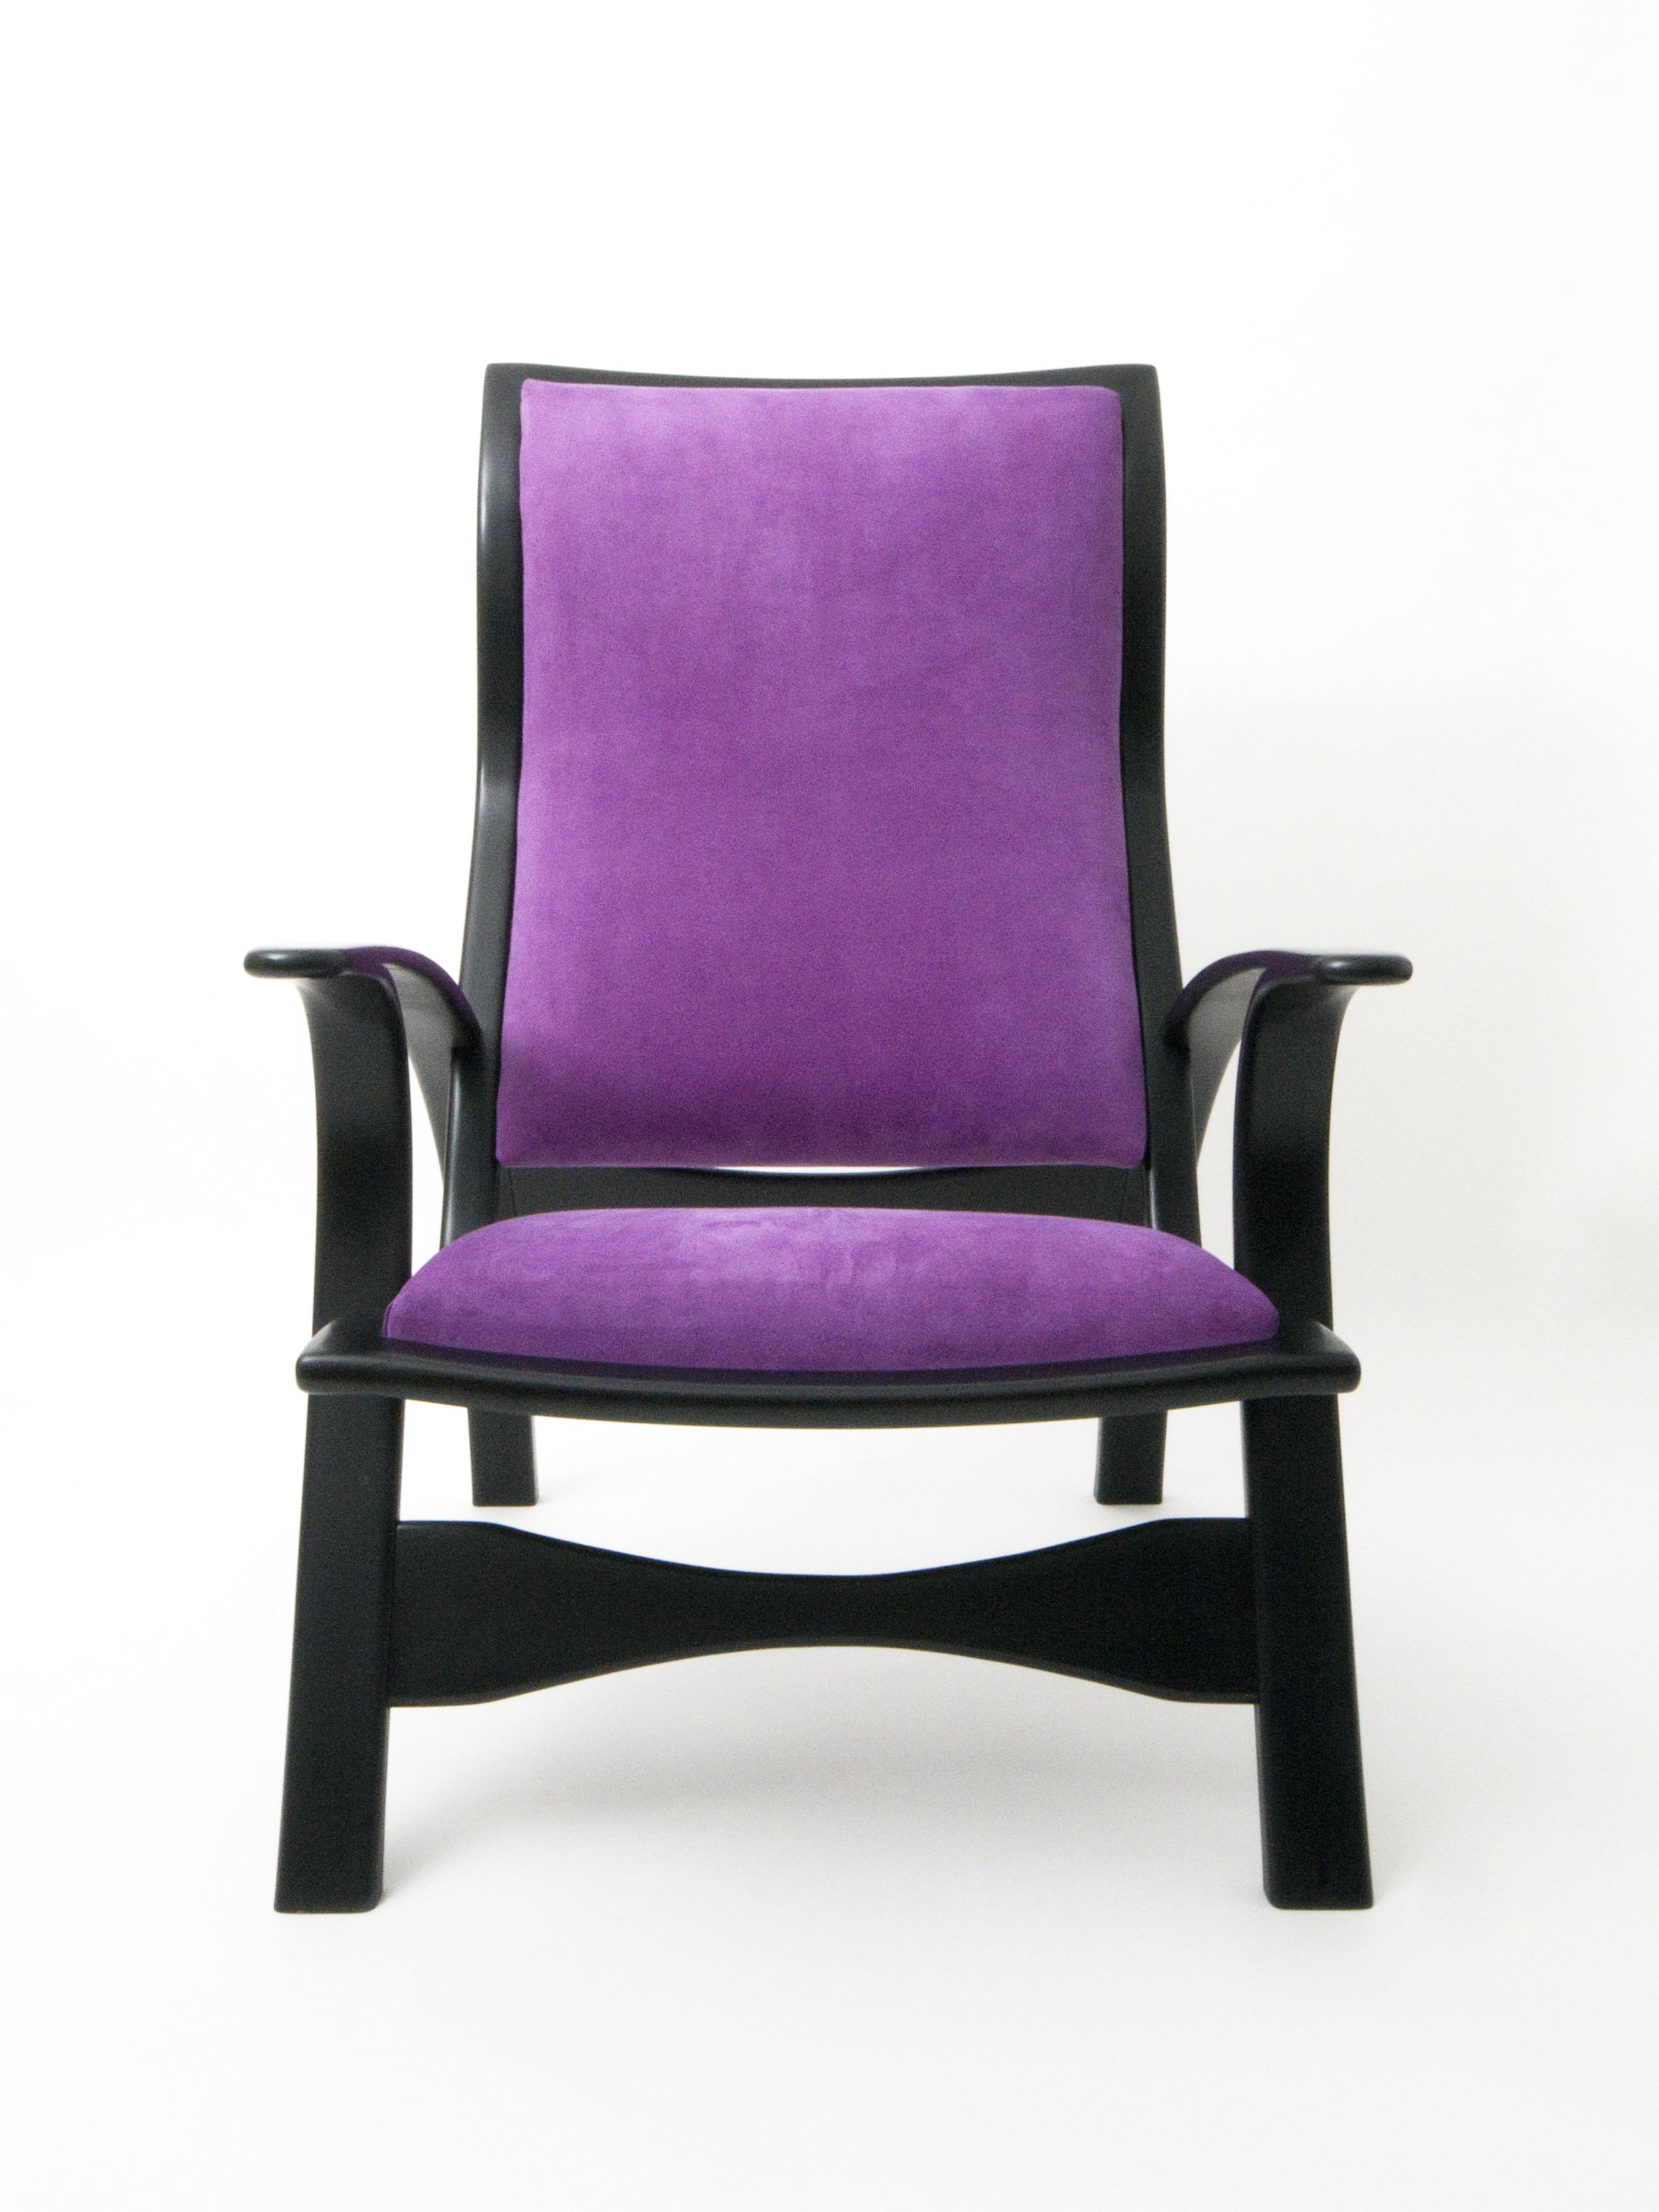 Crown royal chair4.jpg